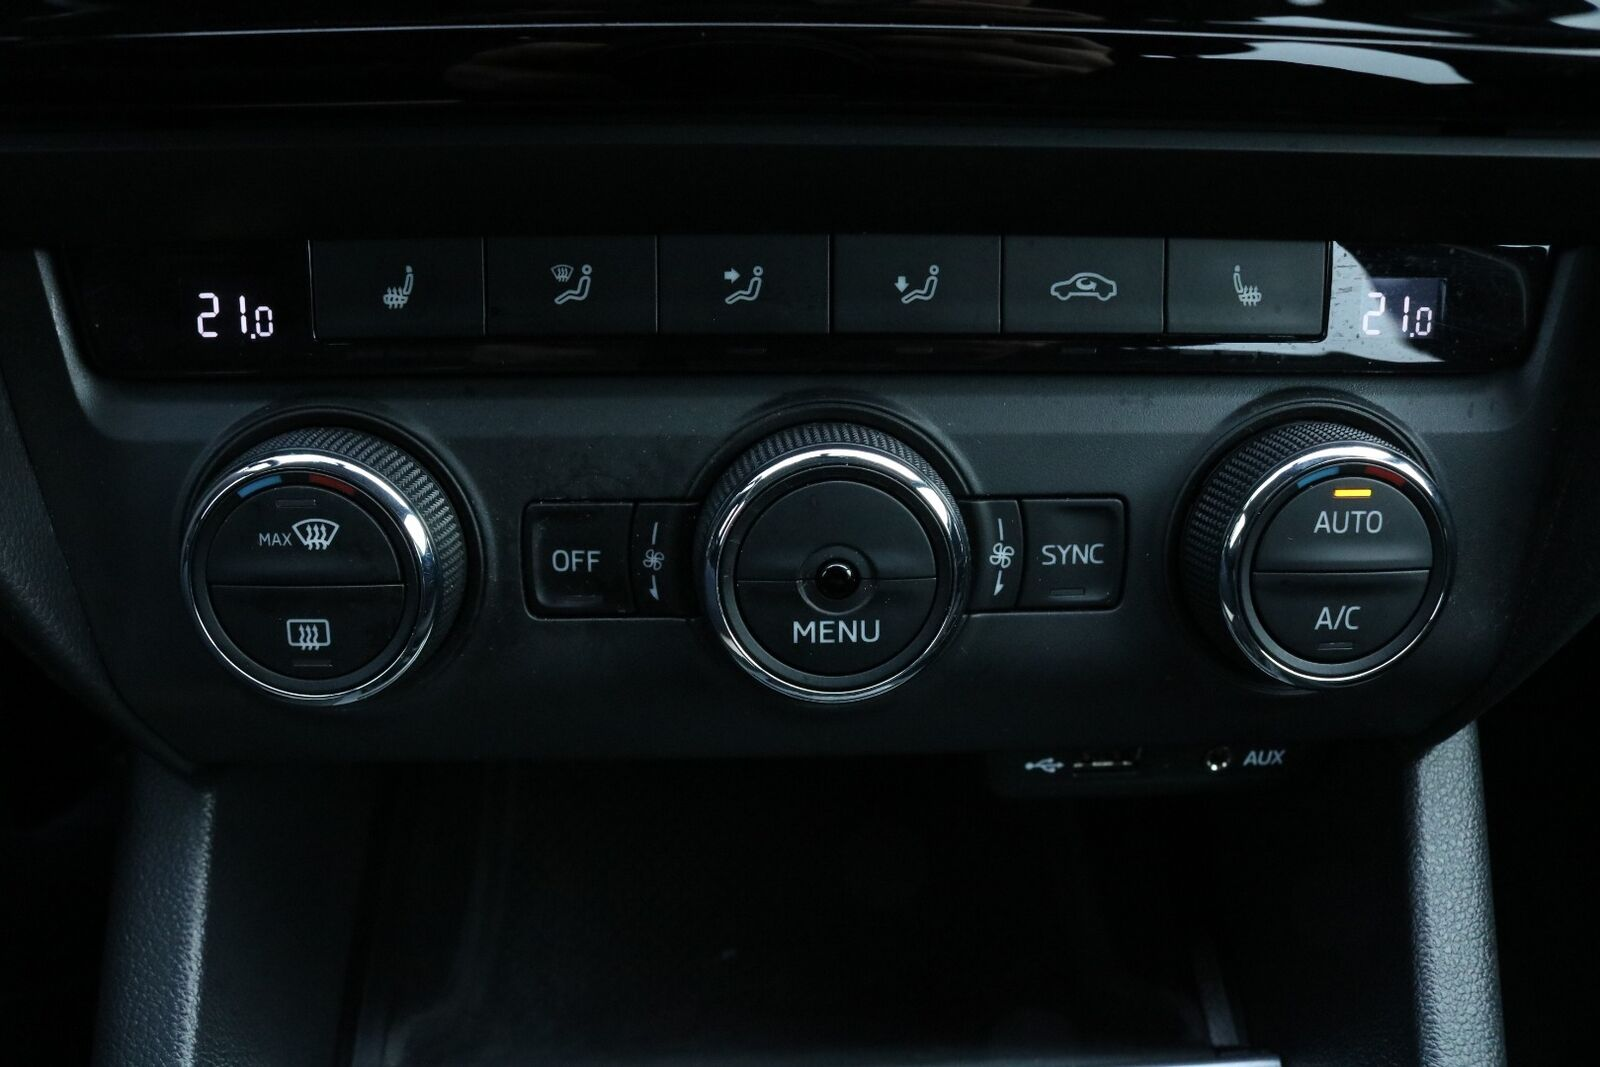 Skoda Octavia TDi 150 Style Combi